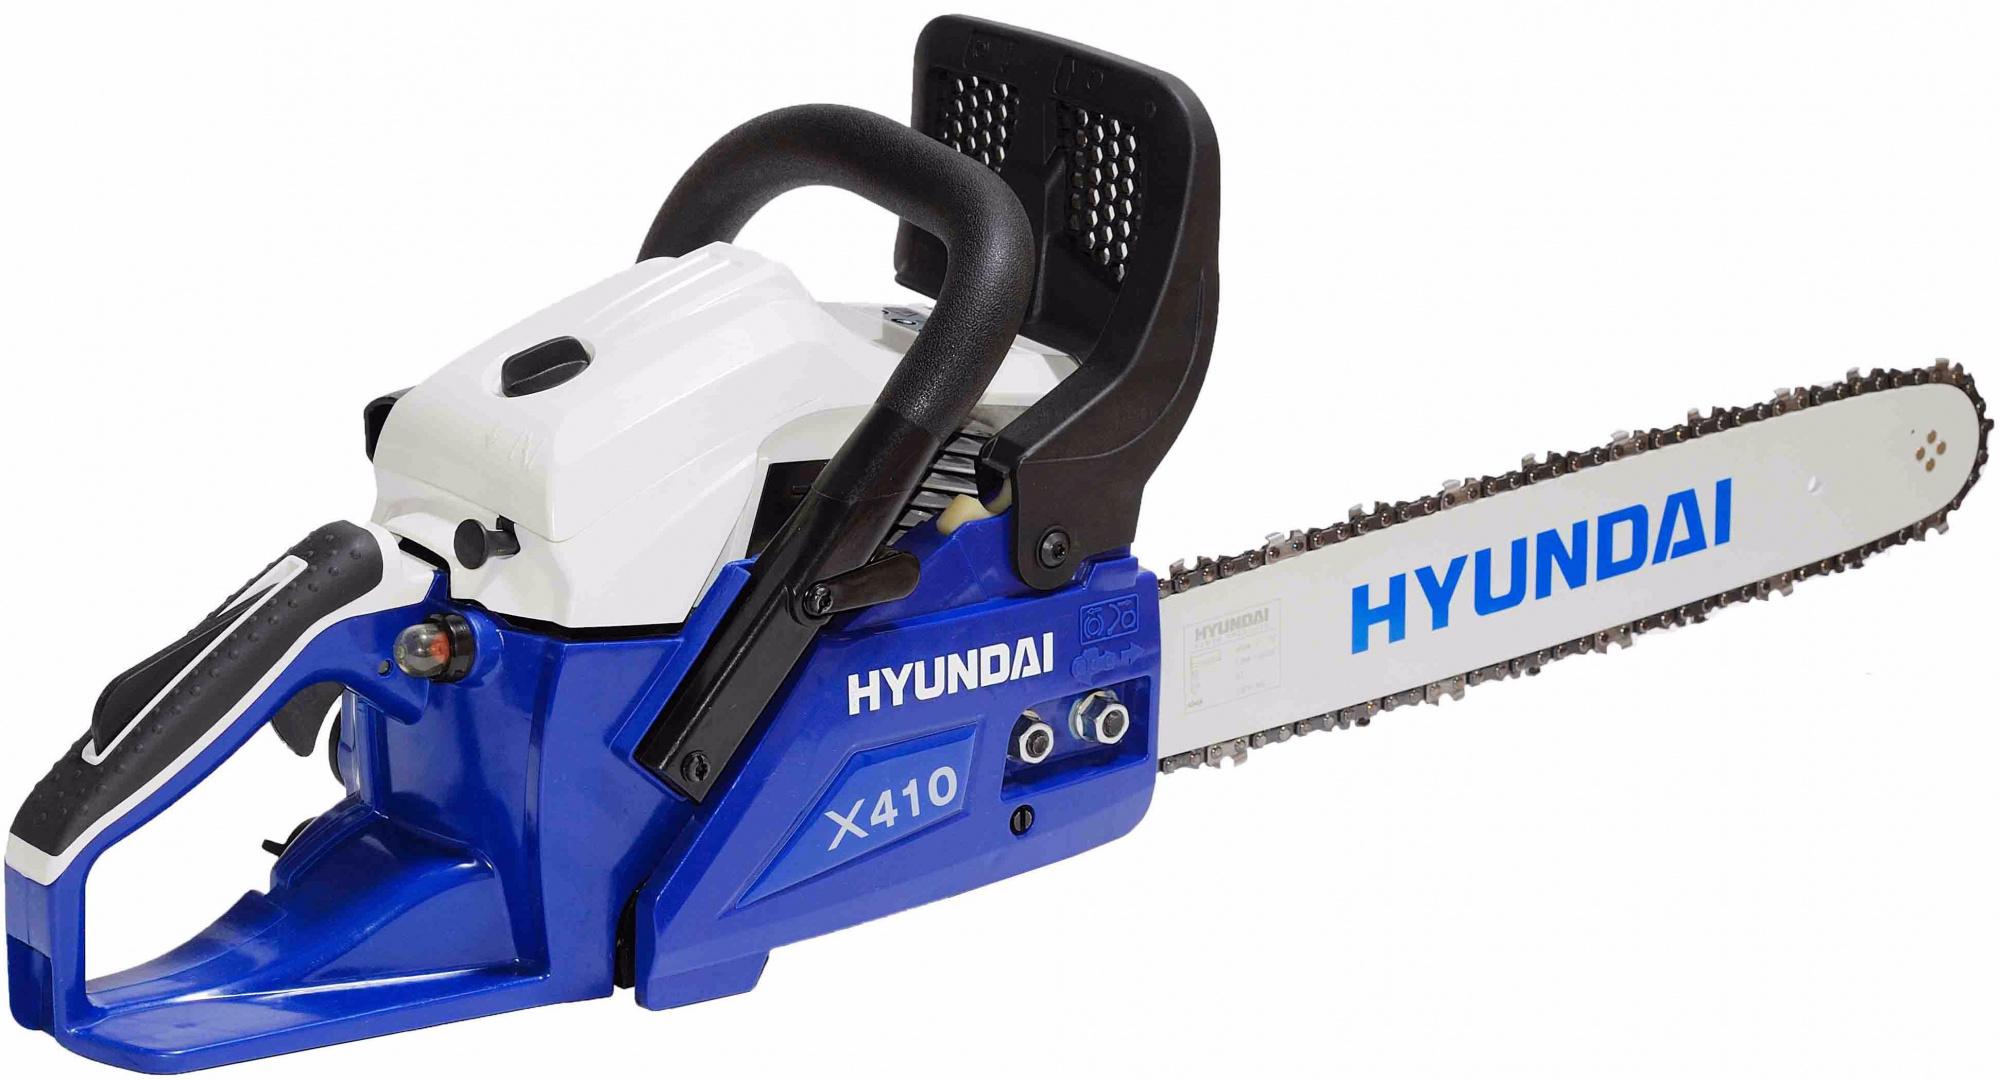 Hyundai X 410 - бензопила (Blue) от iCover